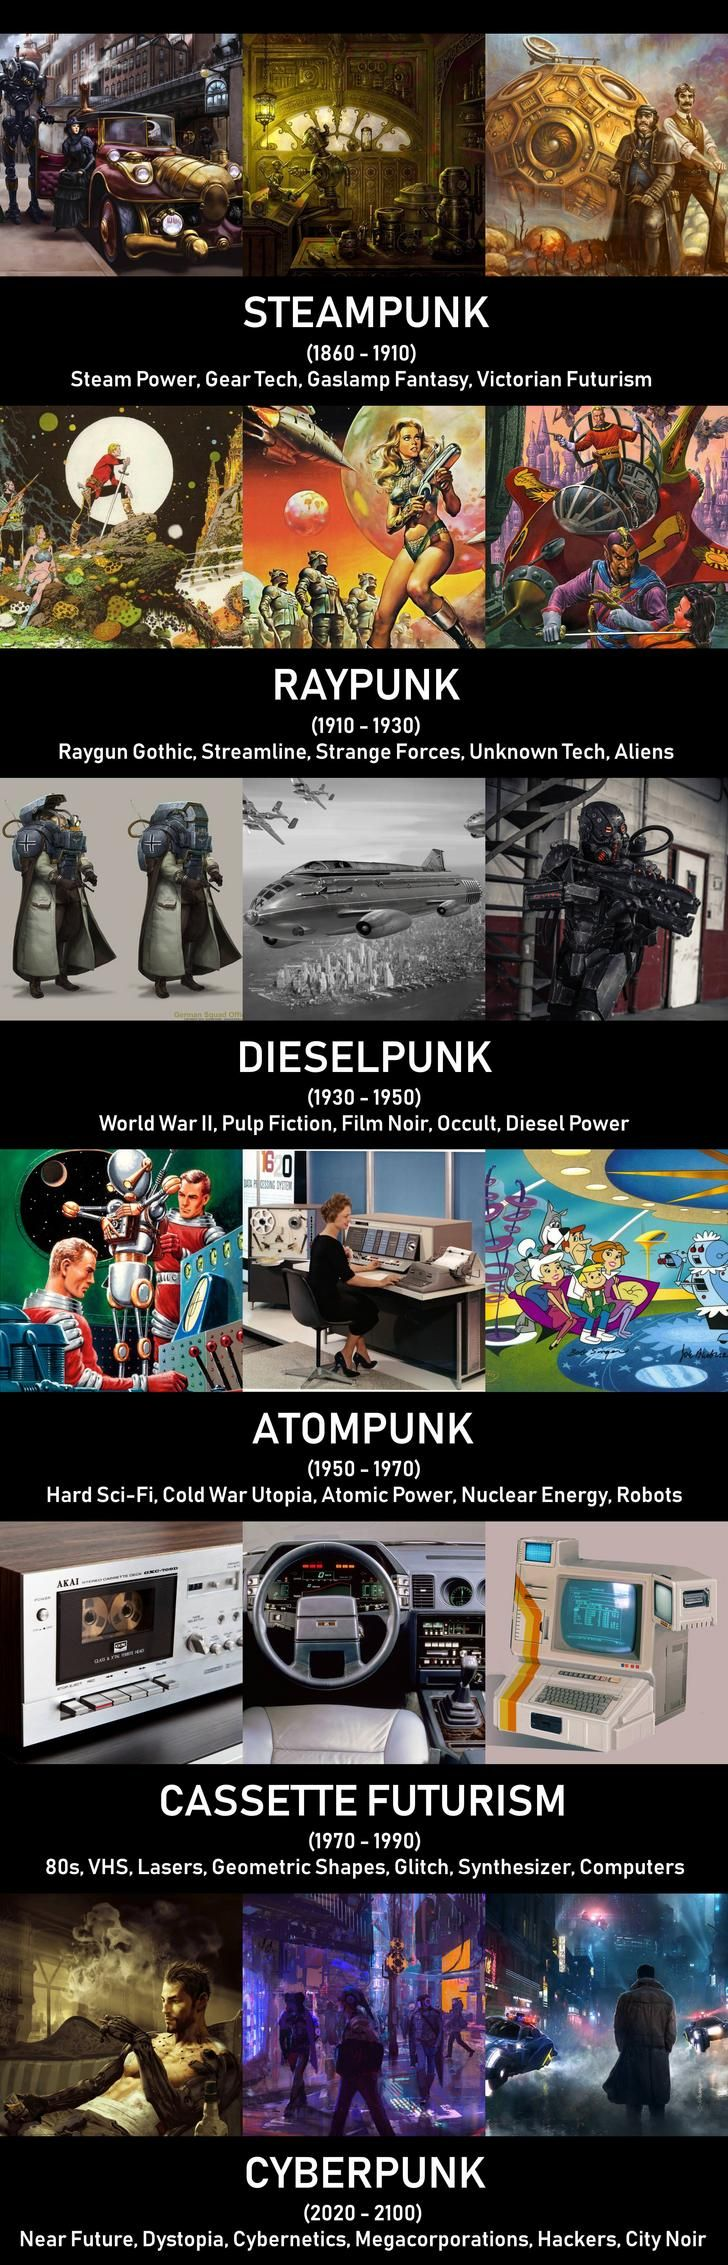 Punk Types Of Different Decades Throwback Thursday Steampunk Cyberpunk Dieselpunk